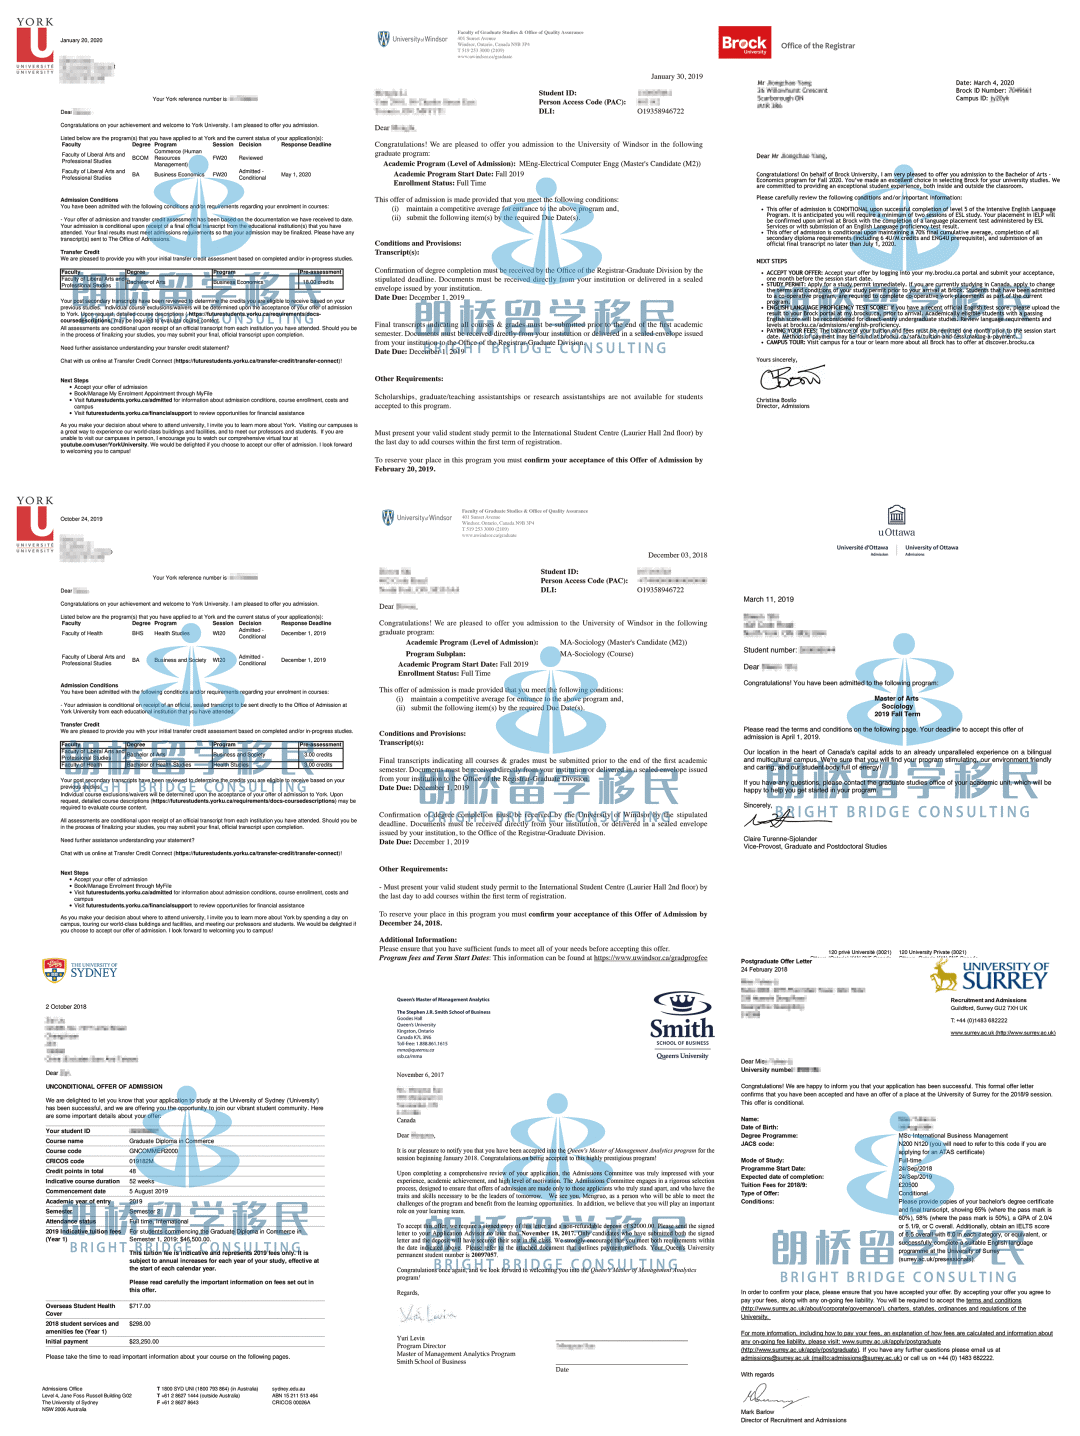 EE分数大涨?何不考虑一下海洋四省留学移民!达尔豪斯大学坐等你们的申请!